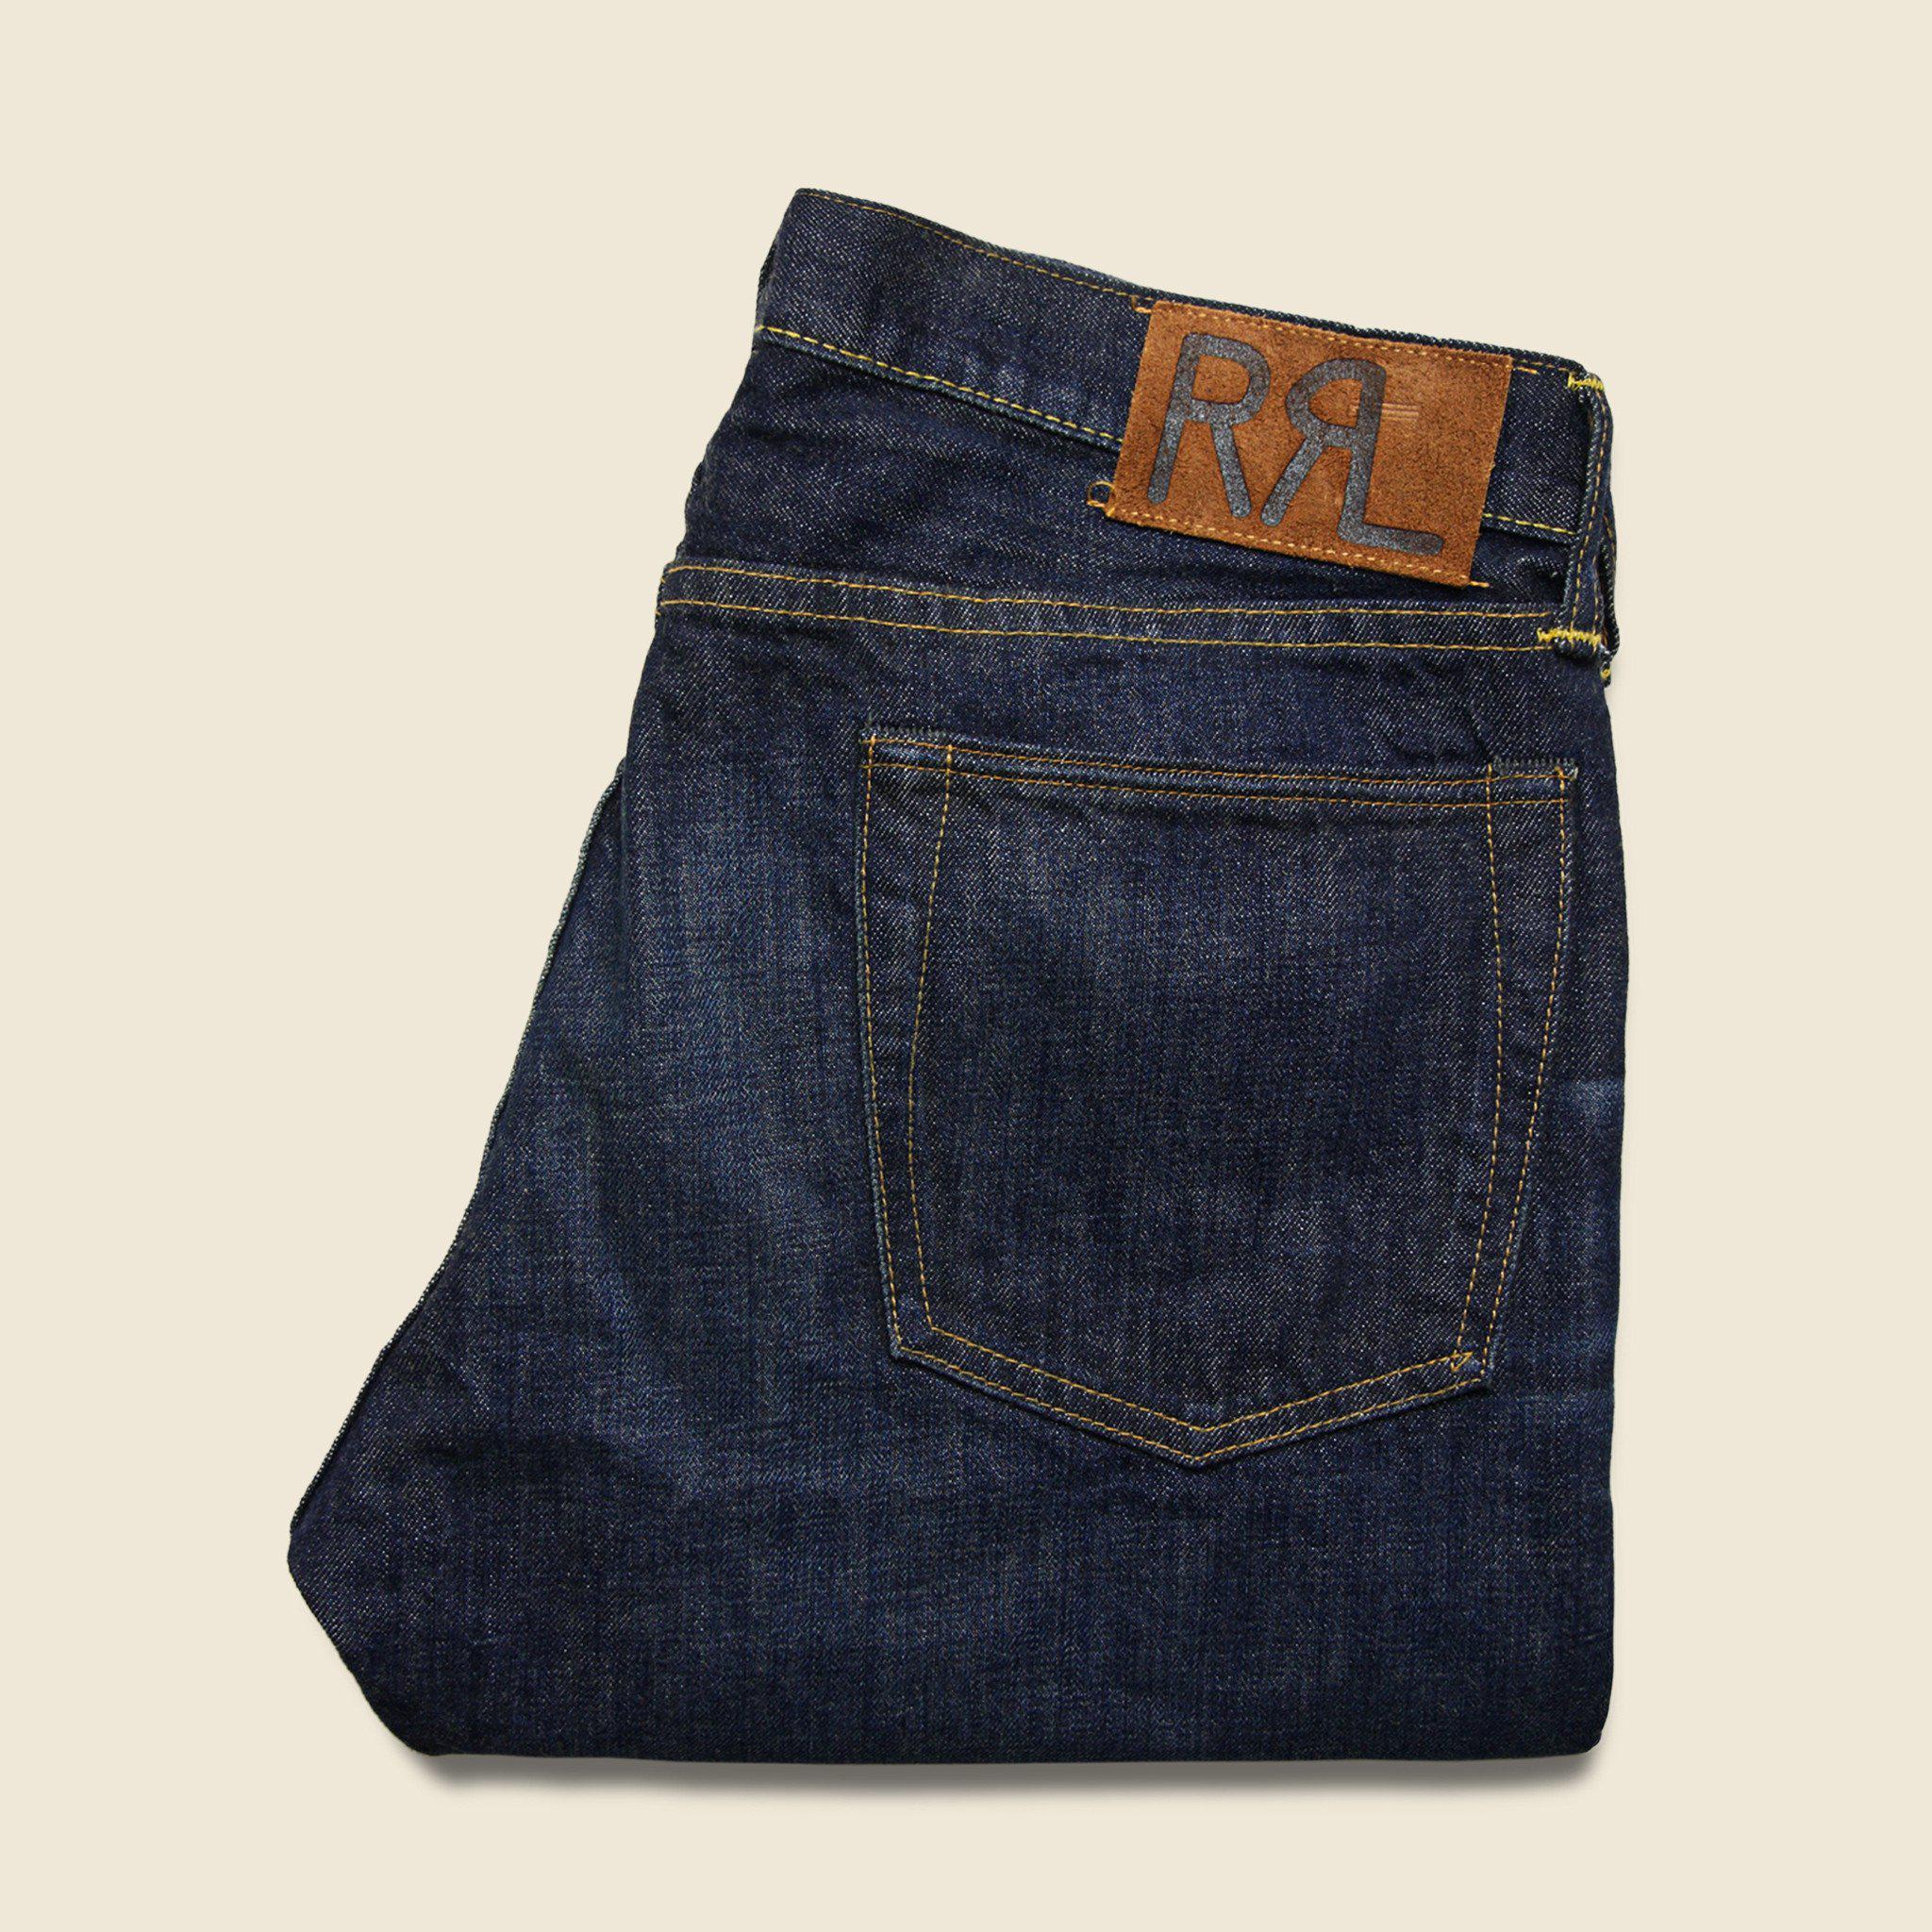 900661c9991 Lyst - RRL Slim Fit Jean - Stillwater 3 in Blue for Men